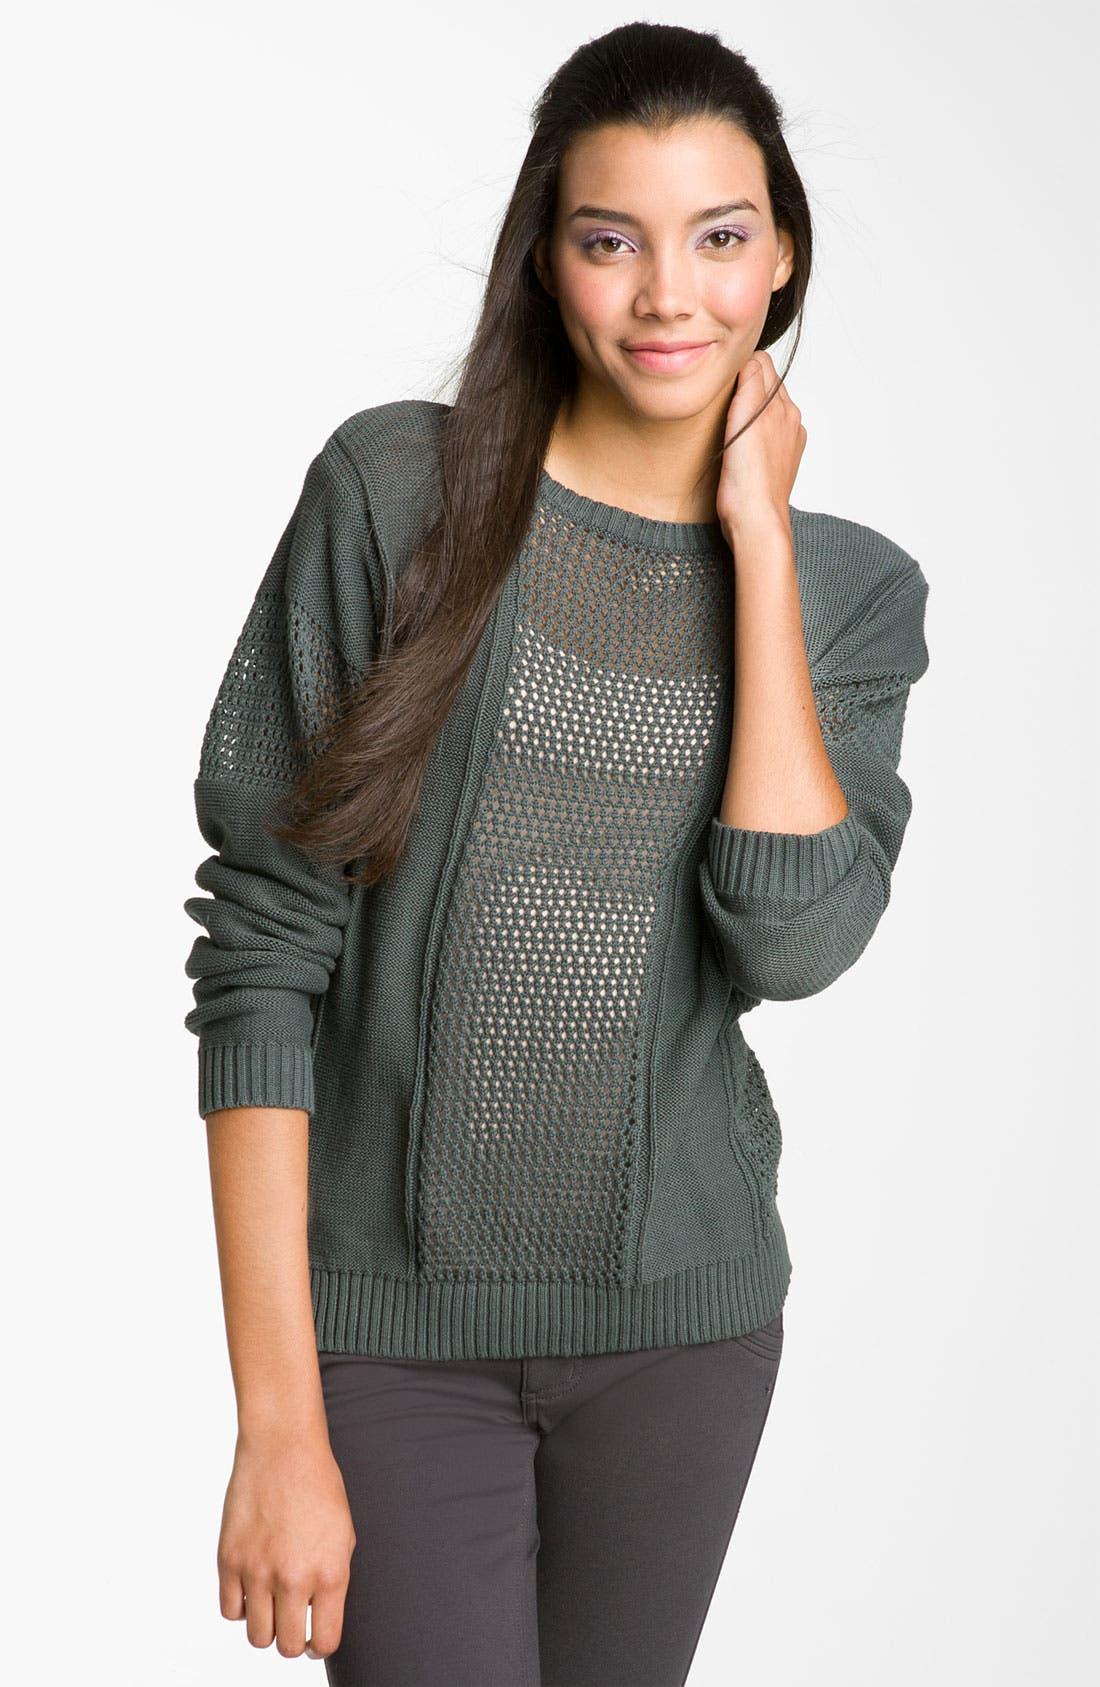 Alternate Image 1 Selected - Rubbish® Open-Weave Panel Sweater (Juniors)